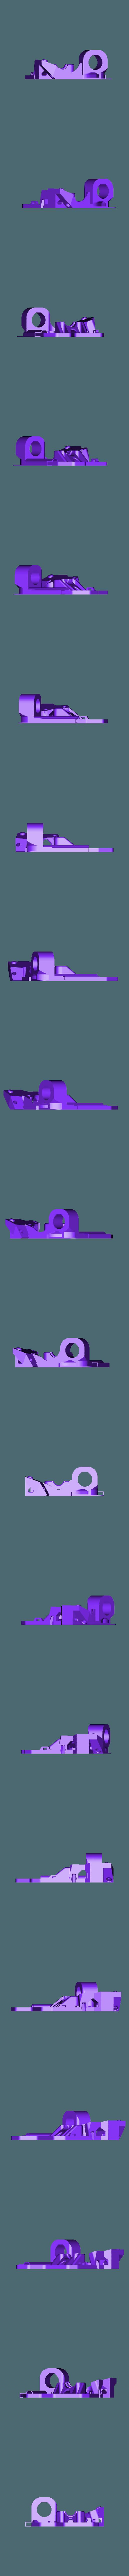 main.stl Download free STL file Lukestruder - The E3D V6 bowden mount for prusa i3 (Anet A8) • 3D printer design, lukeskymuh